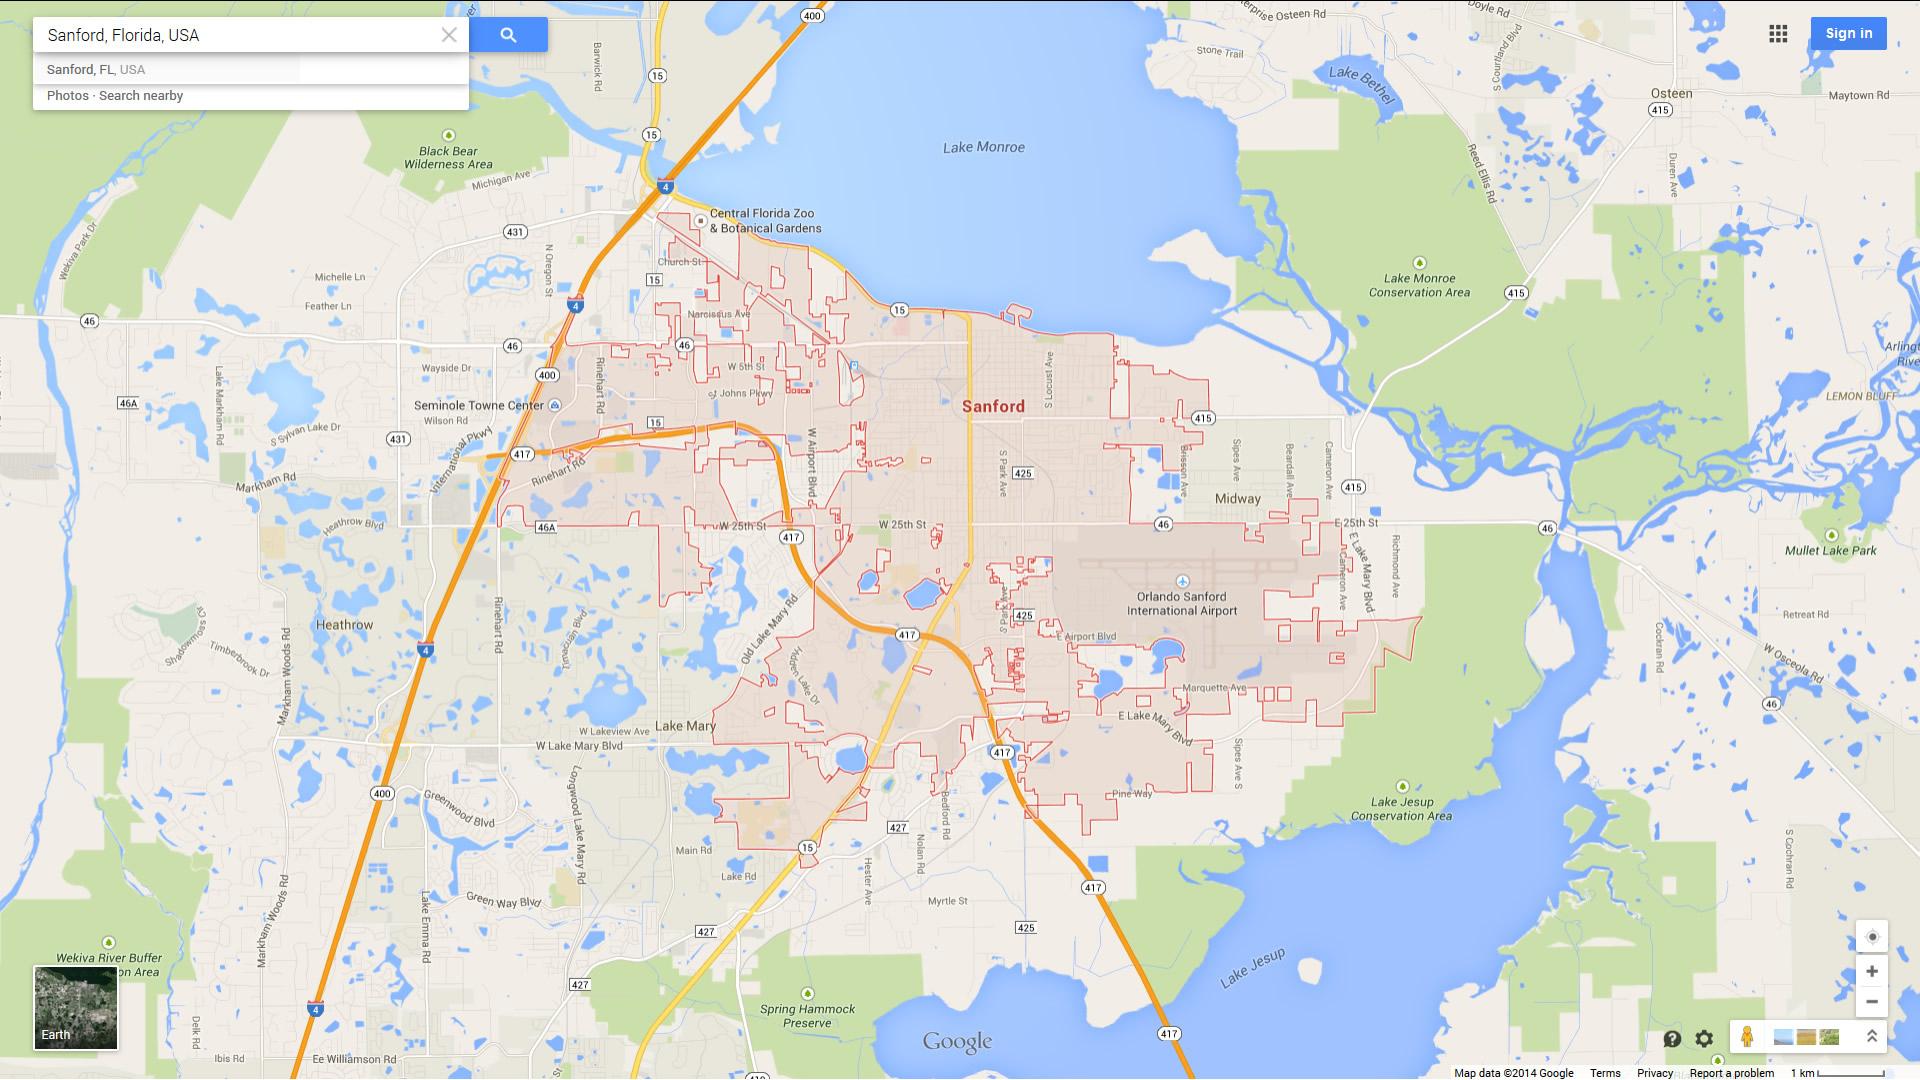 Sanford Florida Map - Sanford Florida Map